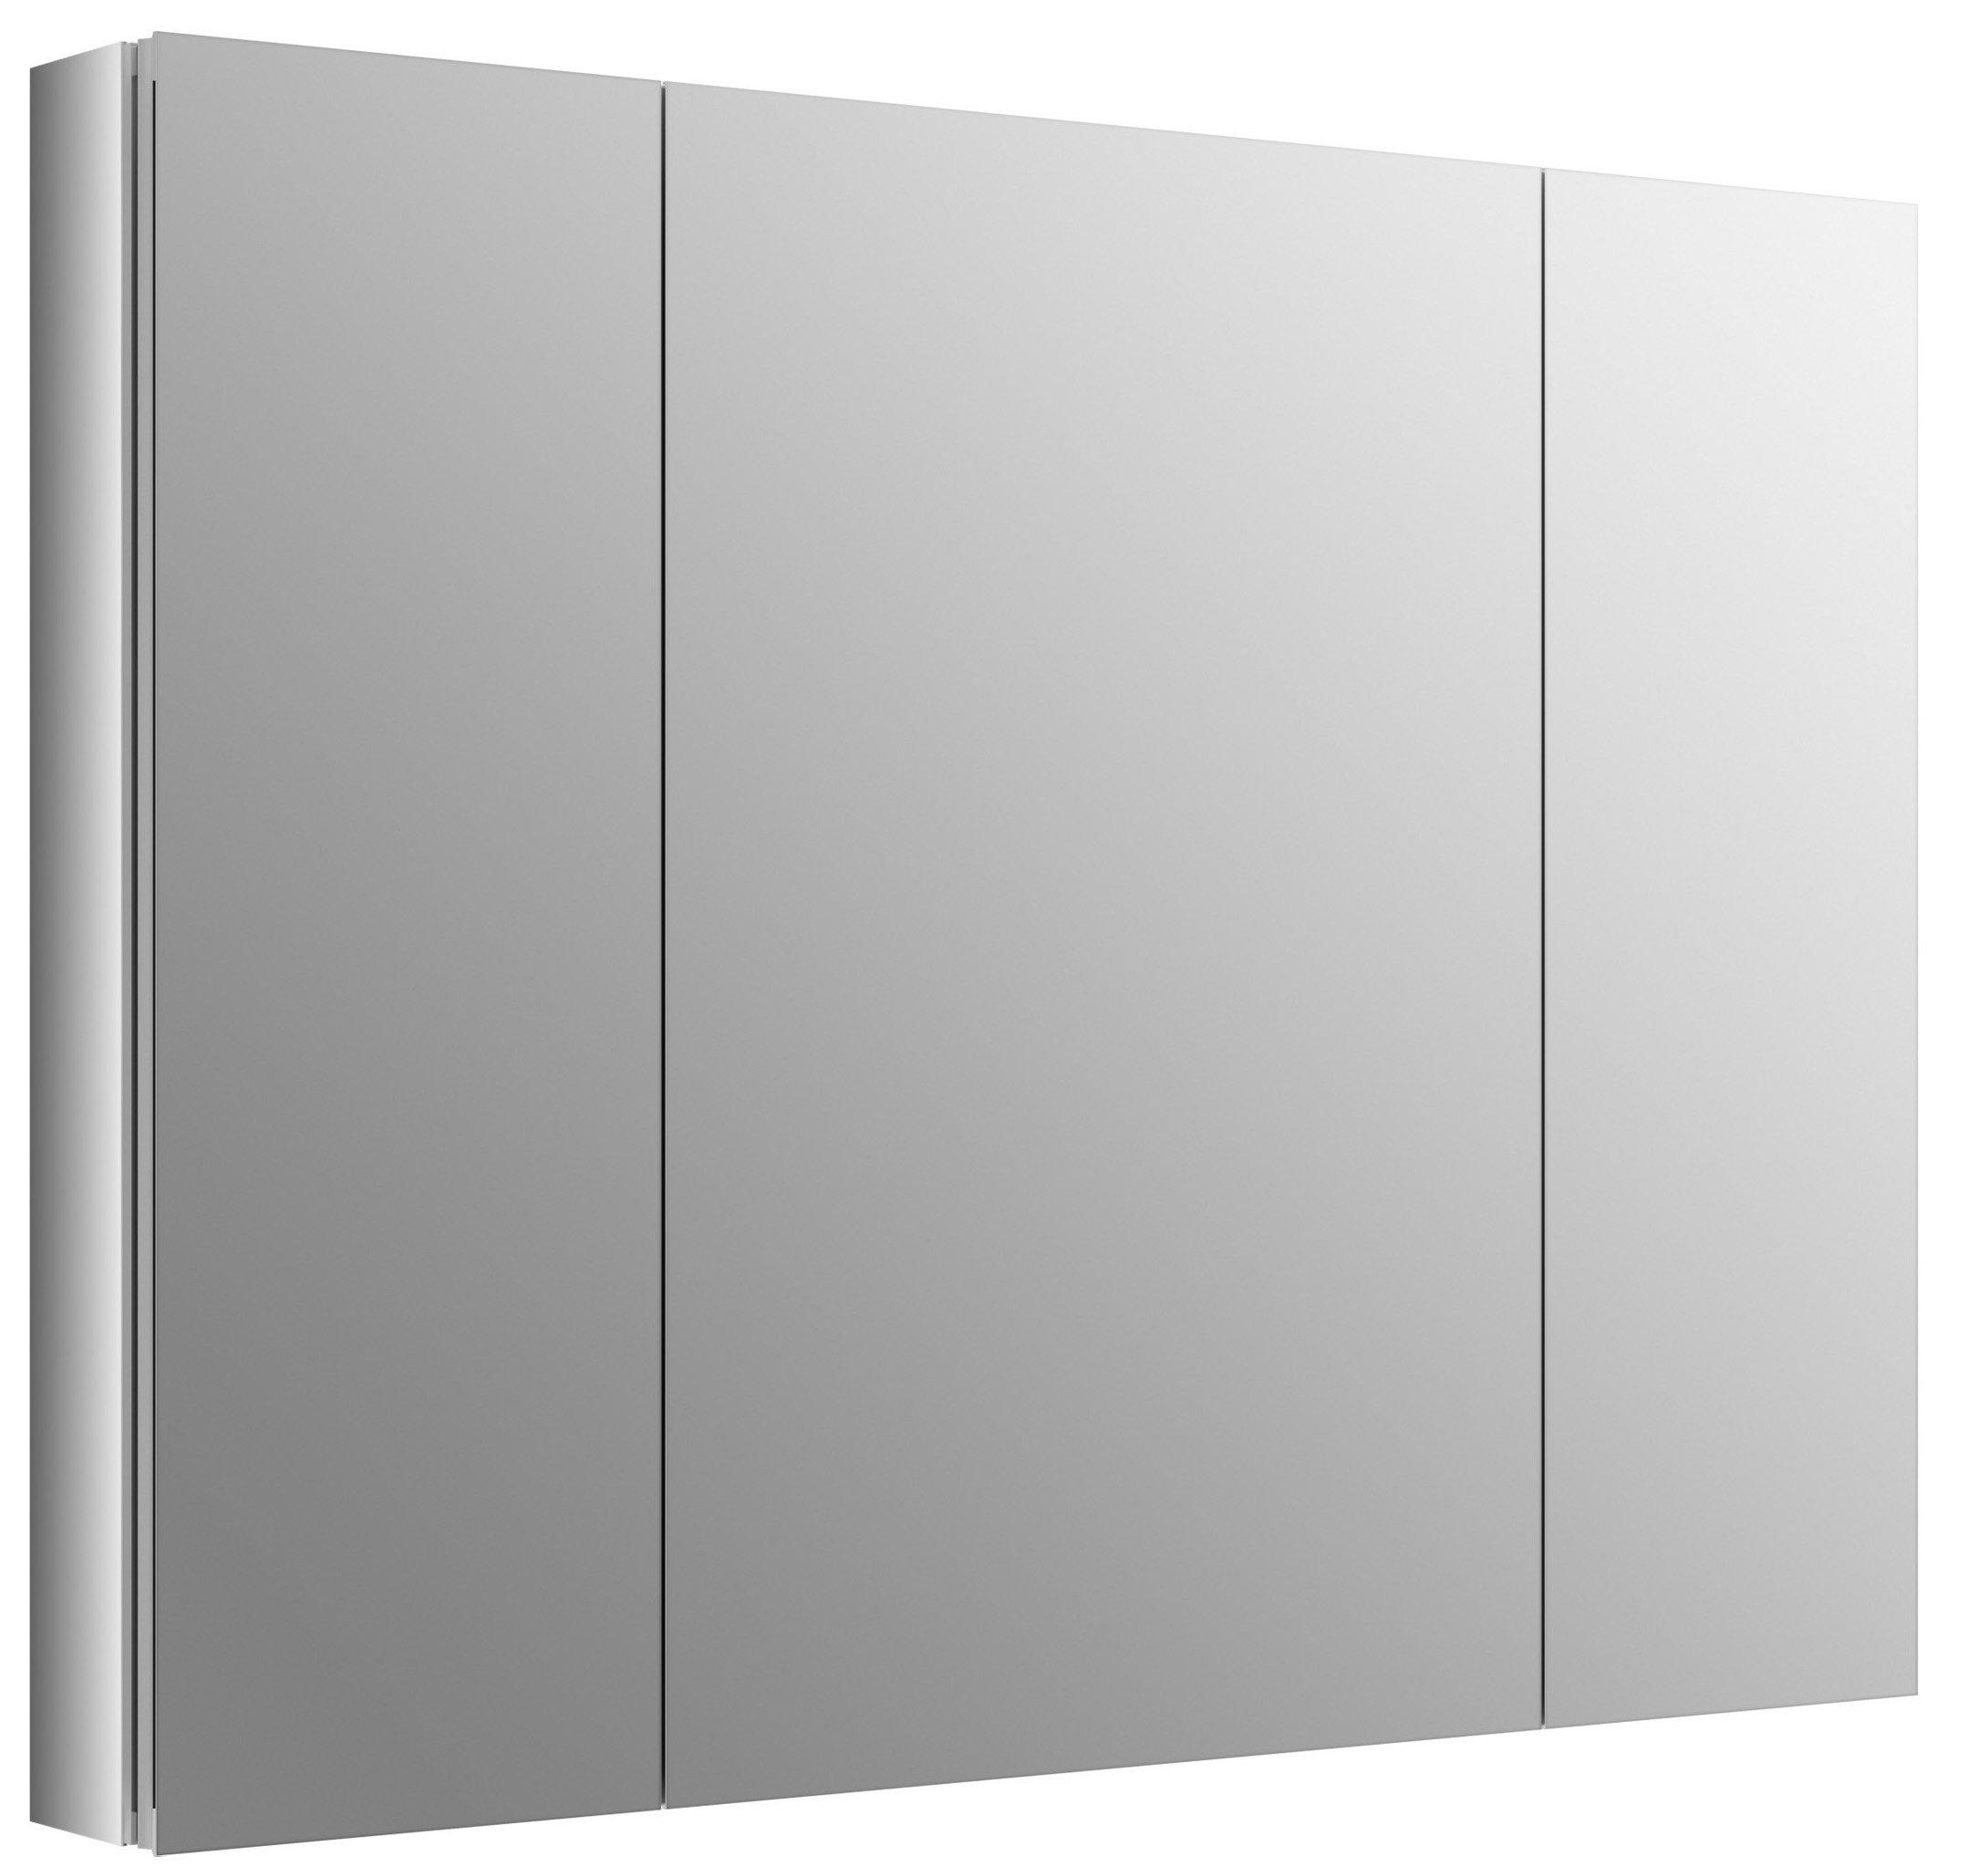 KOHLER K-99010-NA Verdera Medicine Cabinet, 40-Inch x 30-Inch